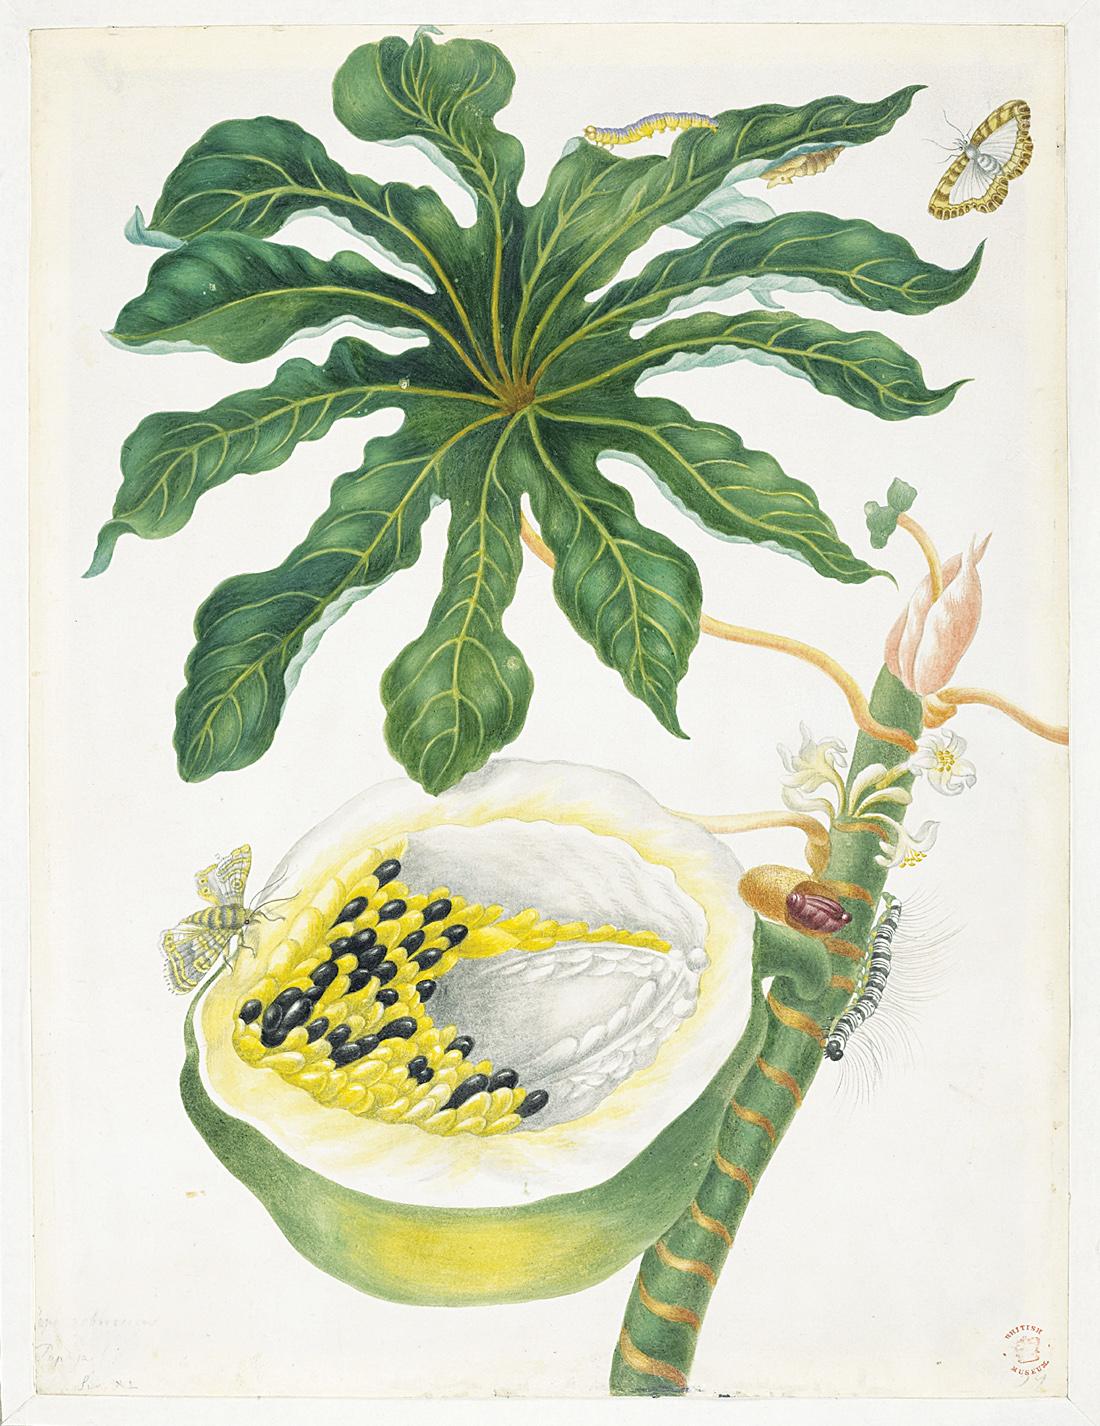 Papaya Bearing Fruit, by Maria Sybille Merian (1647–1717). © 2005, Linda Hall Library of Science, Engineering and Technology, Kansas City, Missouri.